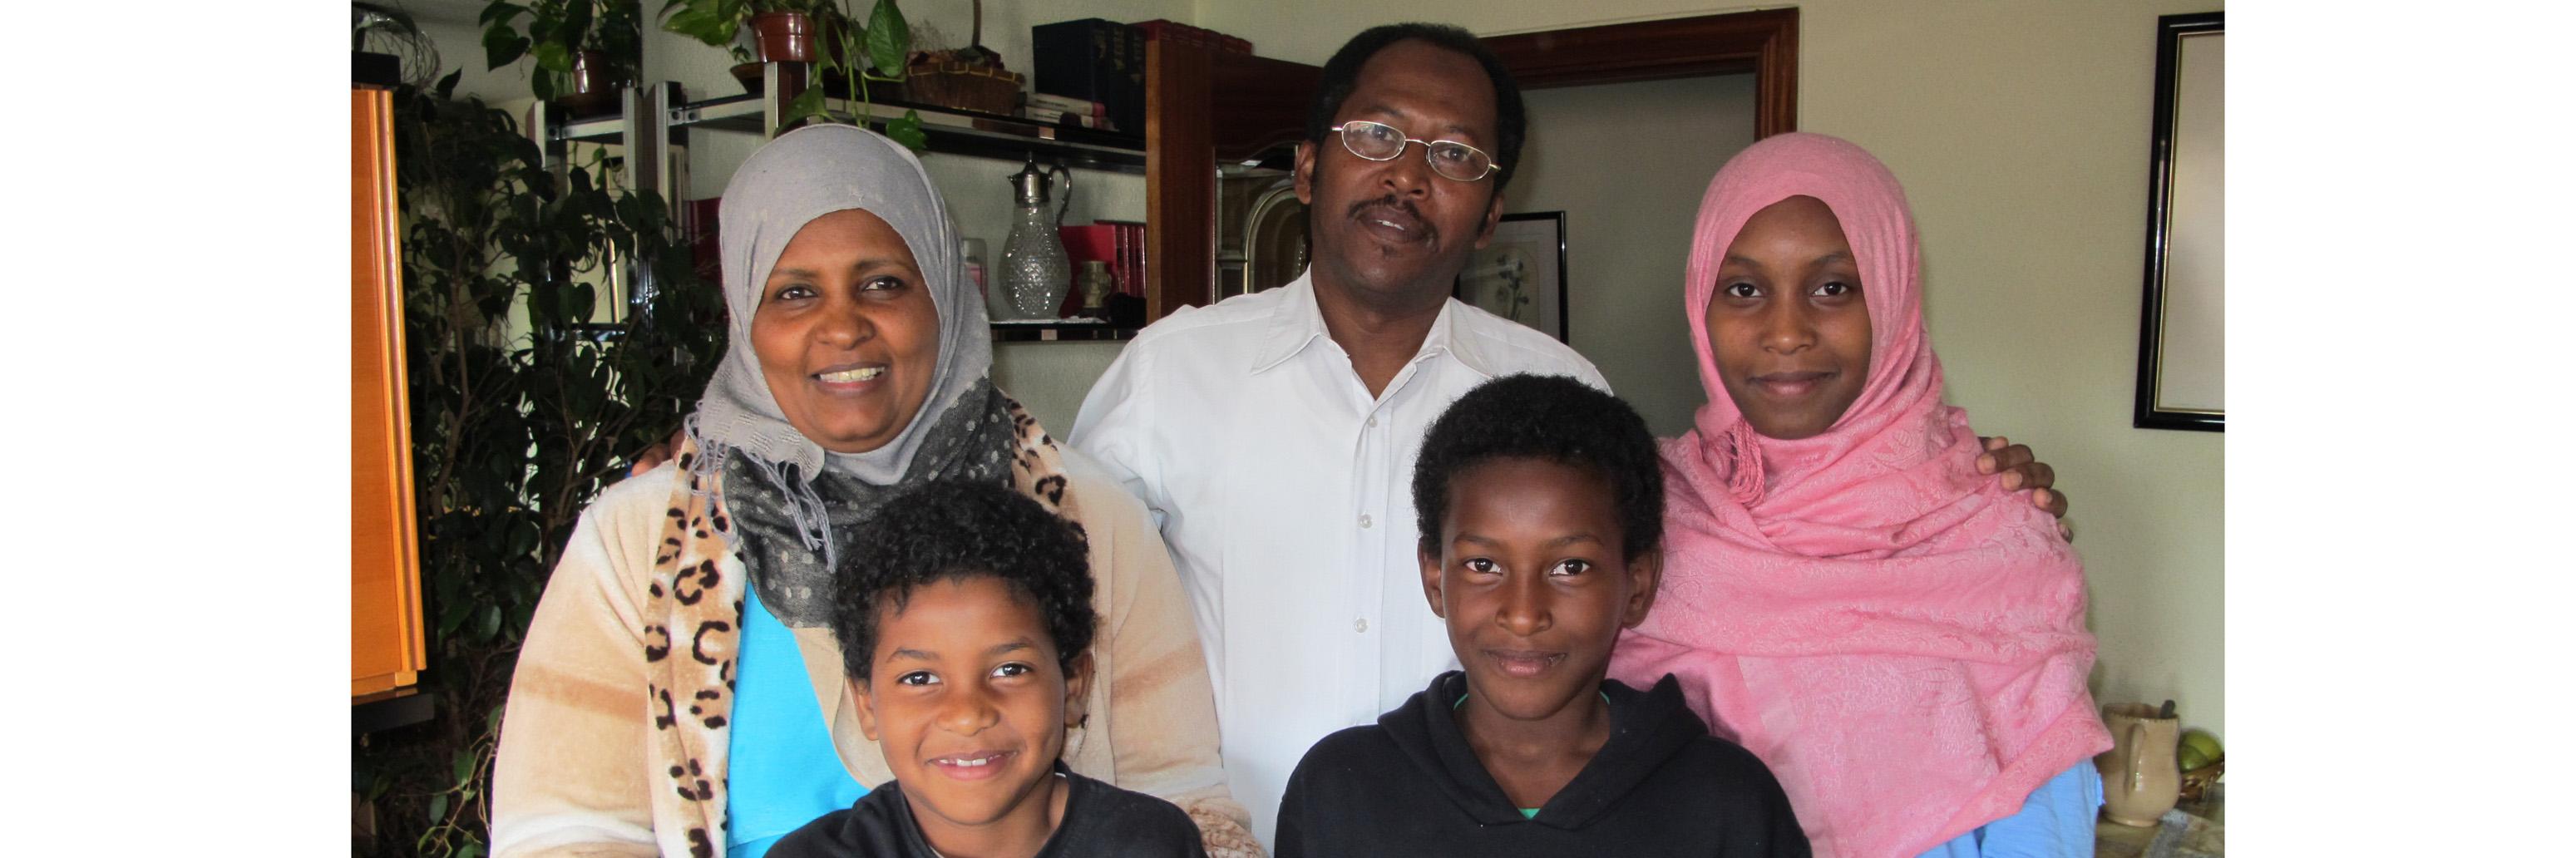 Ismail Ibrahim con su familia